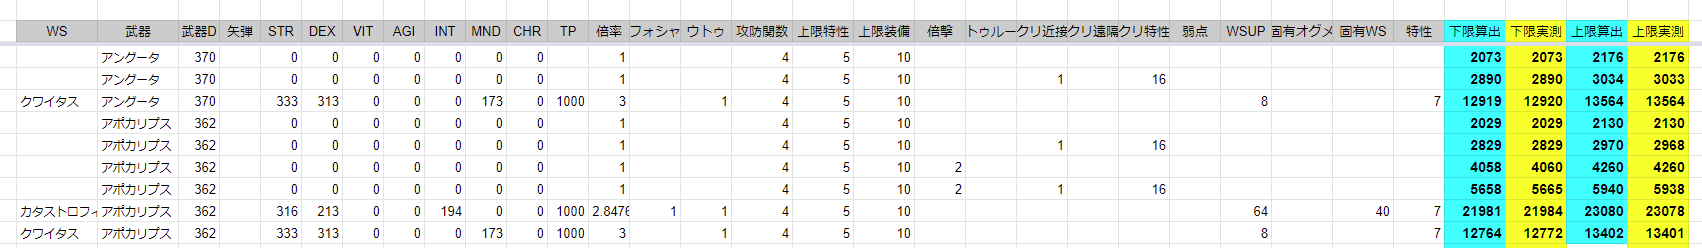 FF11 ダメージ 計算